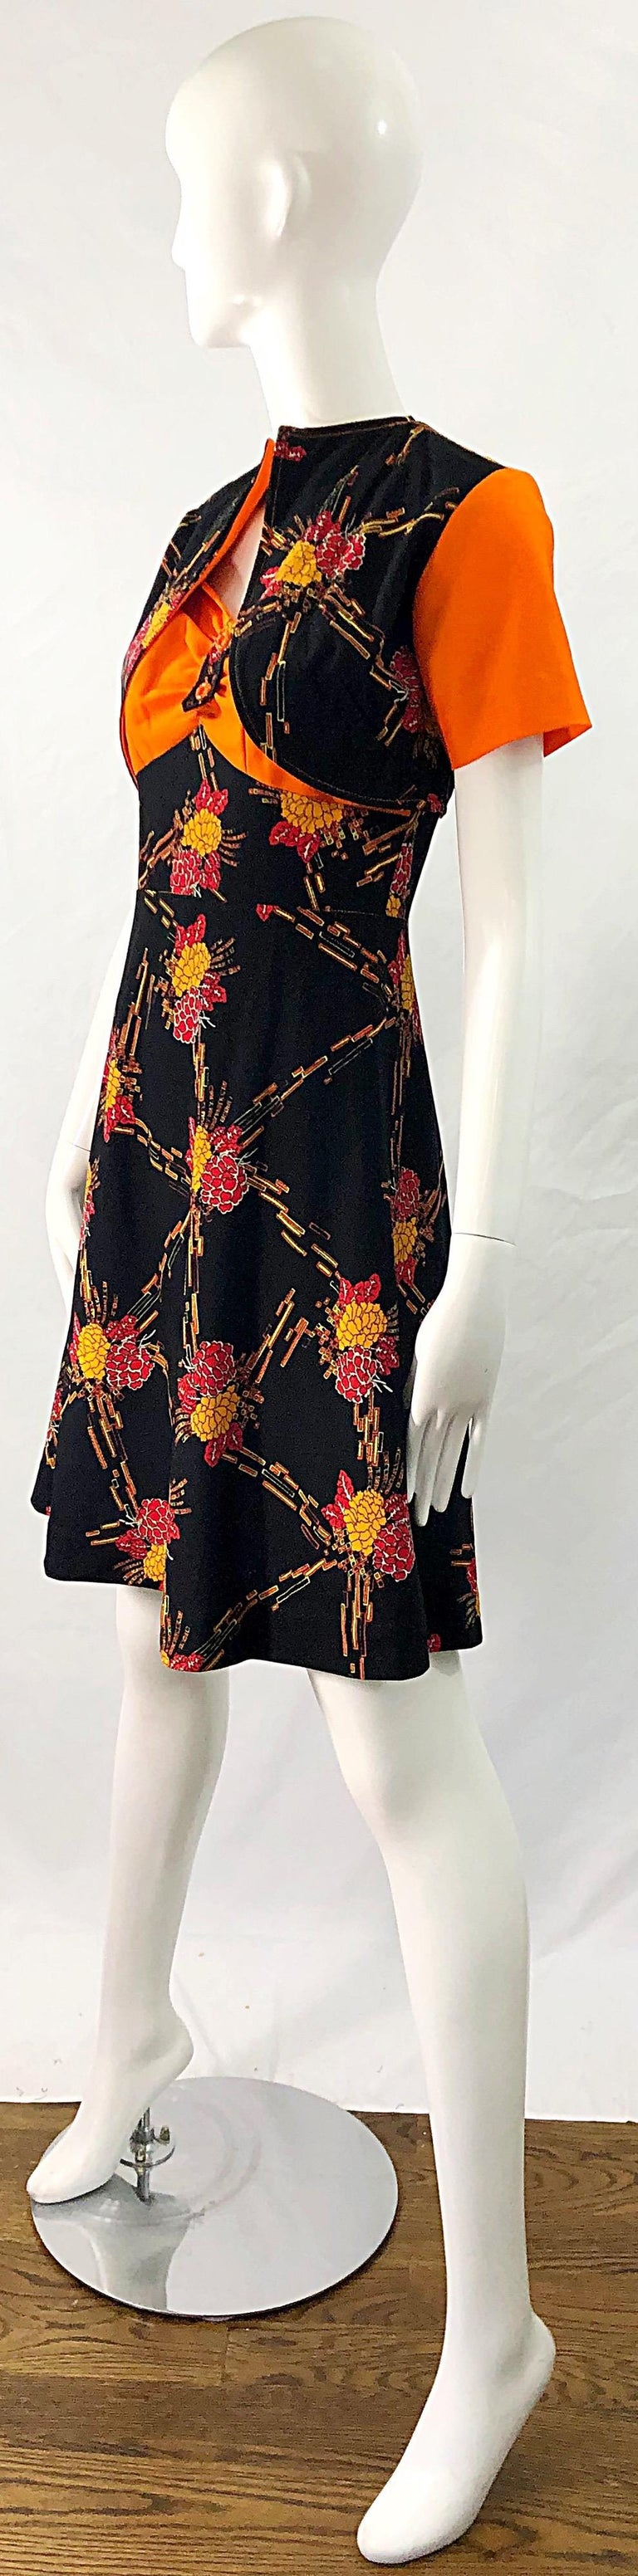 1970s Autumnal Digital Floral Print Knit Vintage 70s A Line Dress + Bolero Top For Sale 8